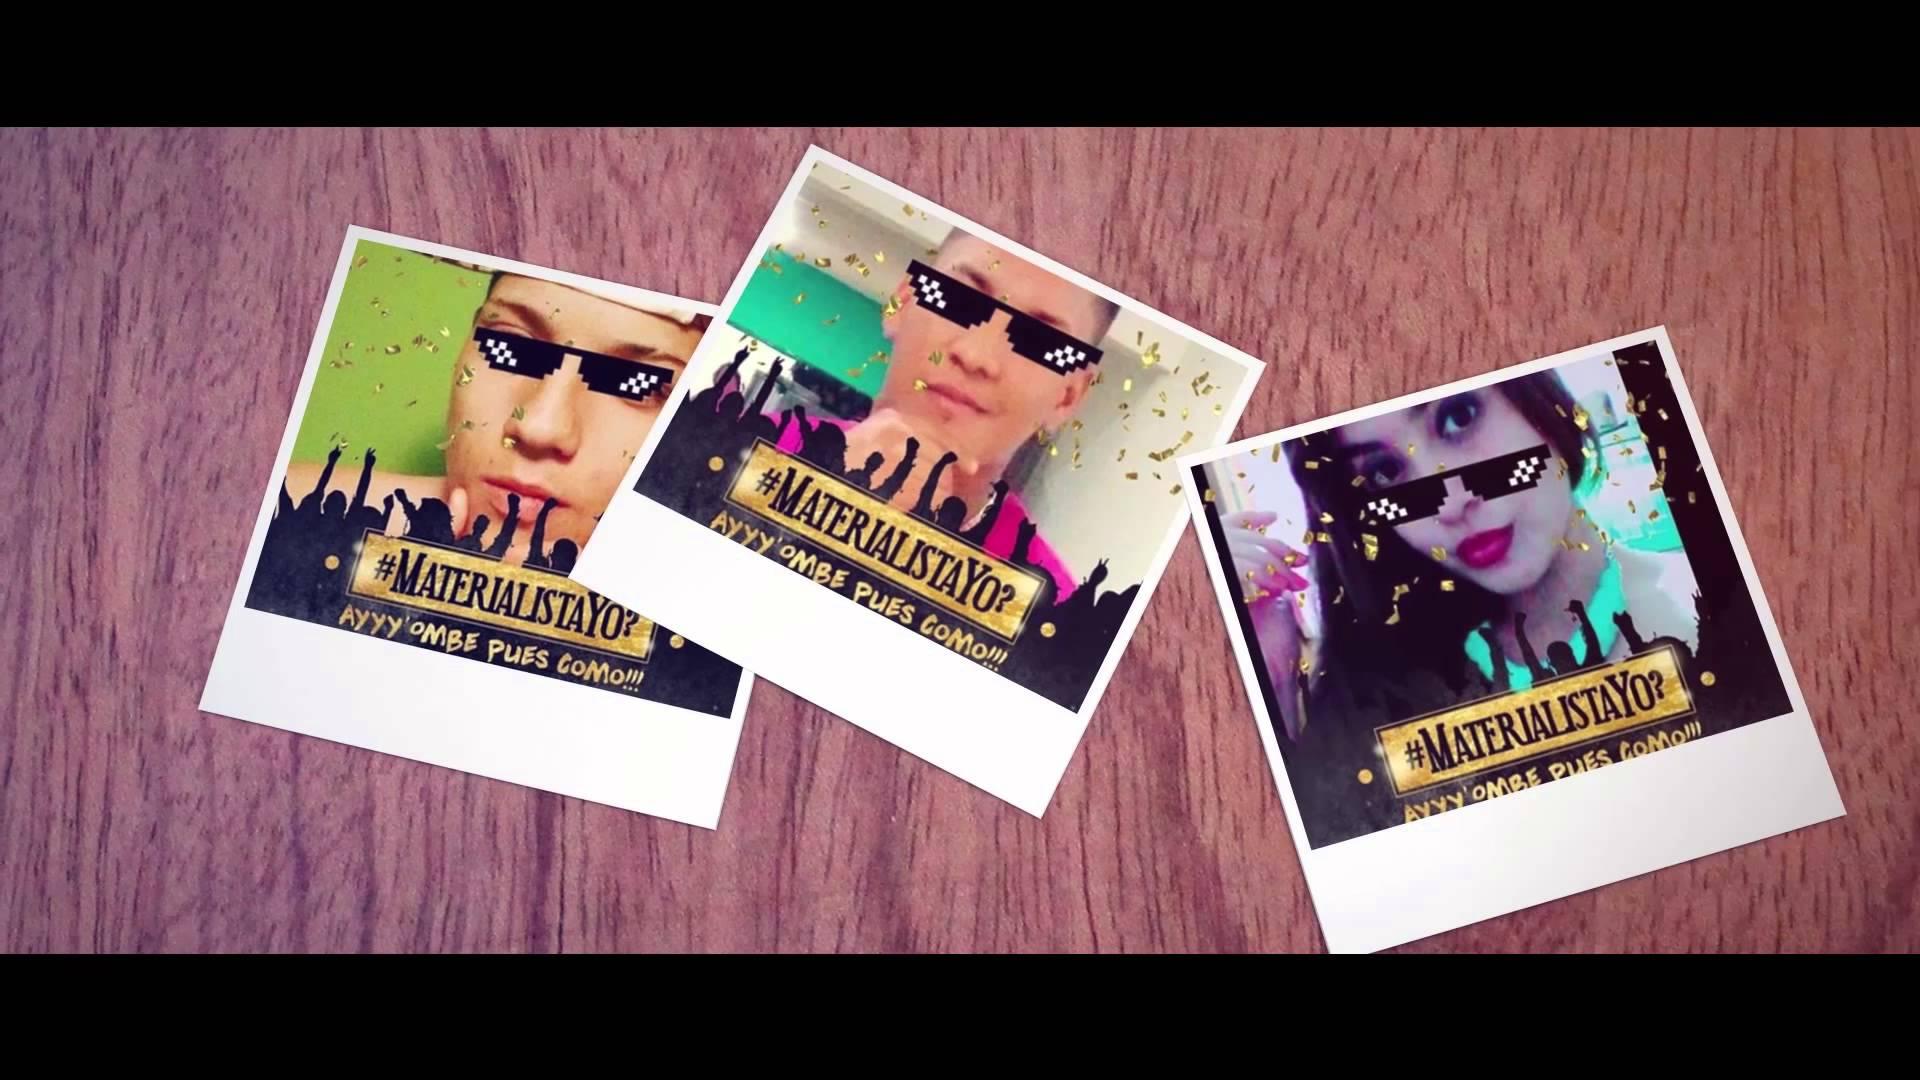 Silvestre Dangond Ft. Nicky Jam – Materialista (Video Lyric)